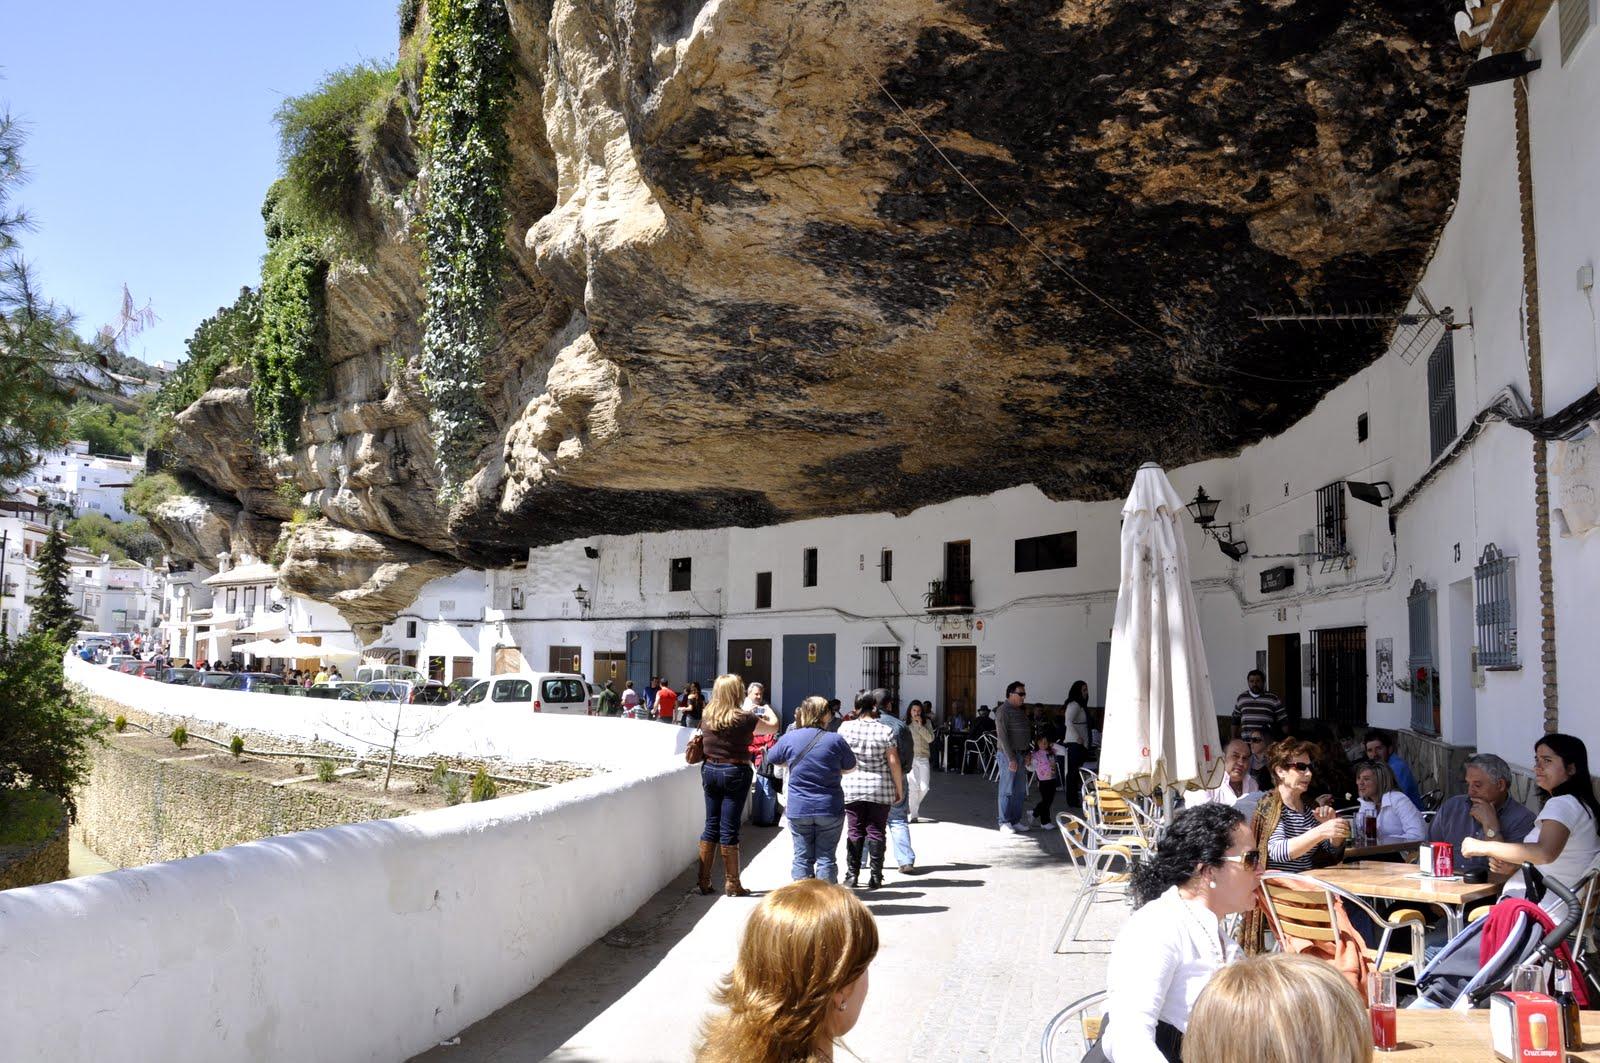 The Town Of Setenil De Las Bodegas - Spain